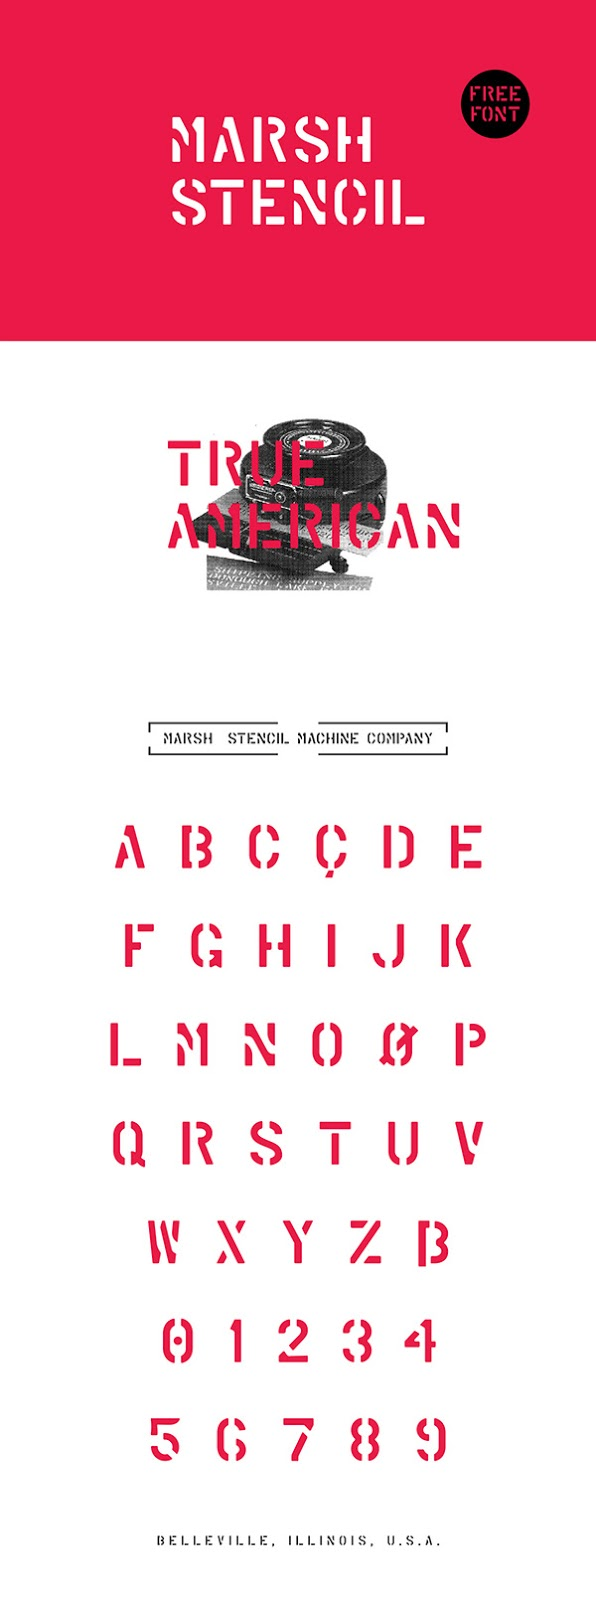 Download Gratis Font Terbaru September 2015 - Marsh Stencil - Free Font